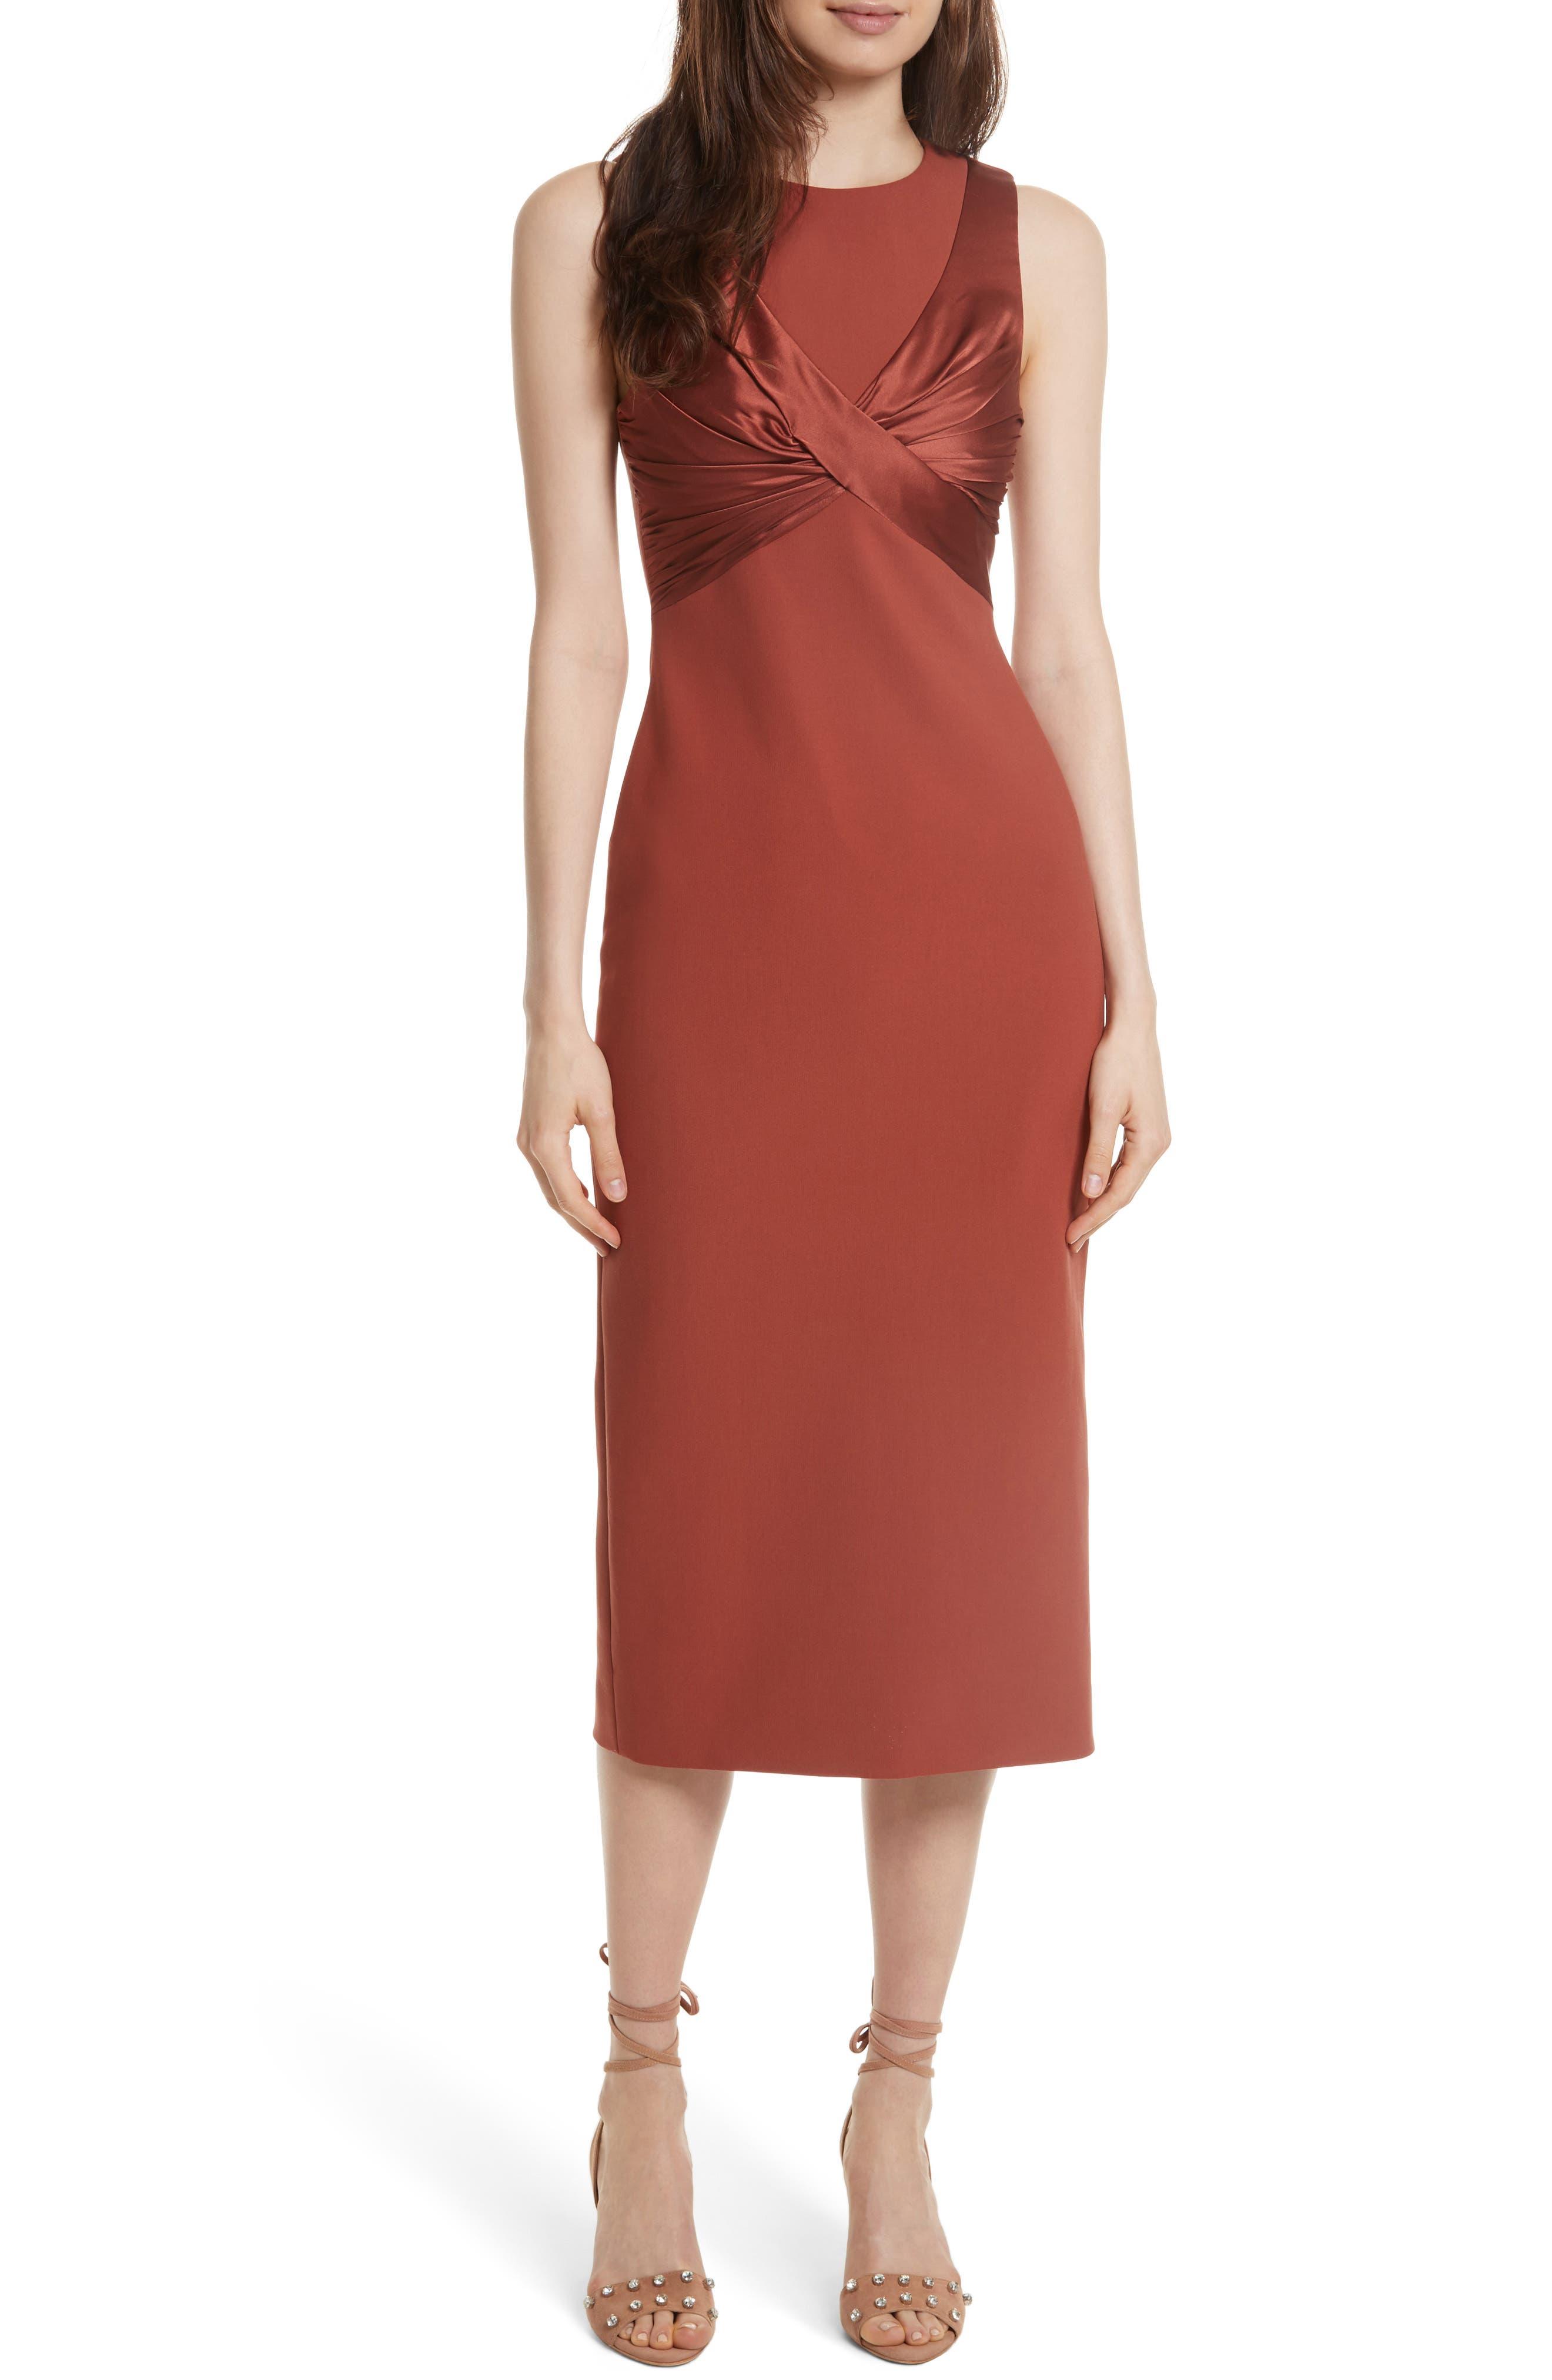 Adelise Crossover Sleeveless Sheath Dress,                             Main thumbnail 1, color,                             Tobacco